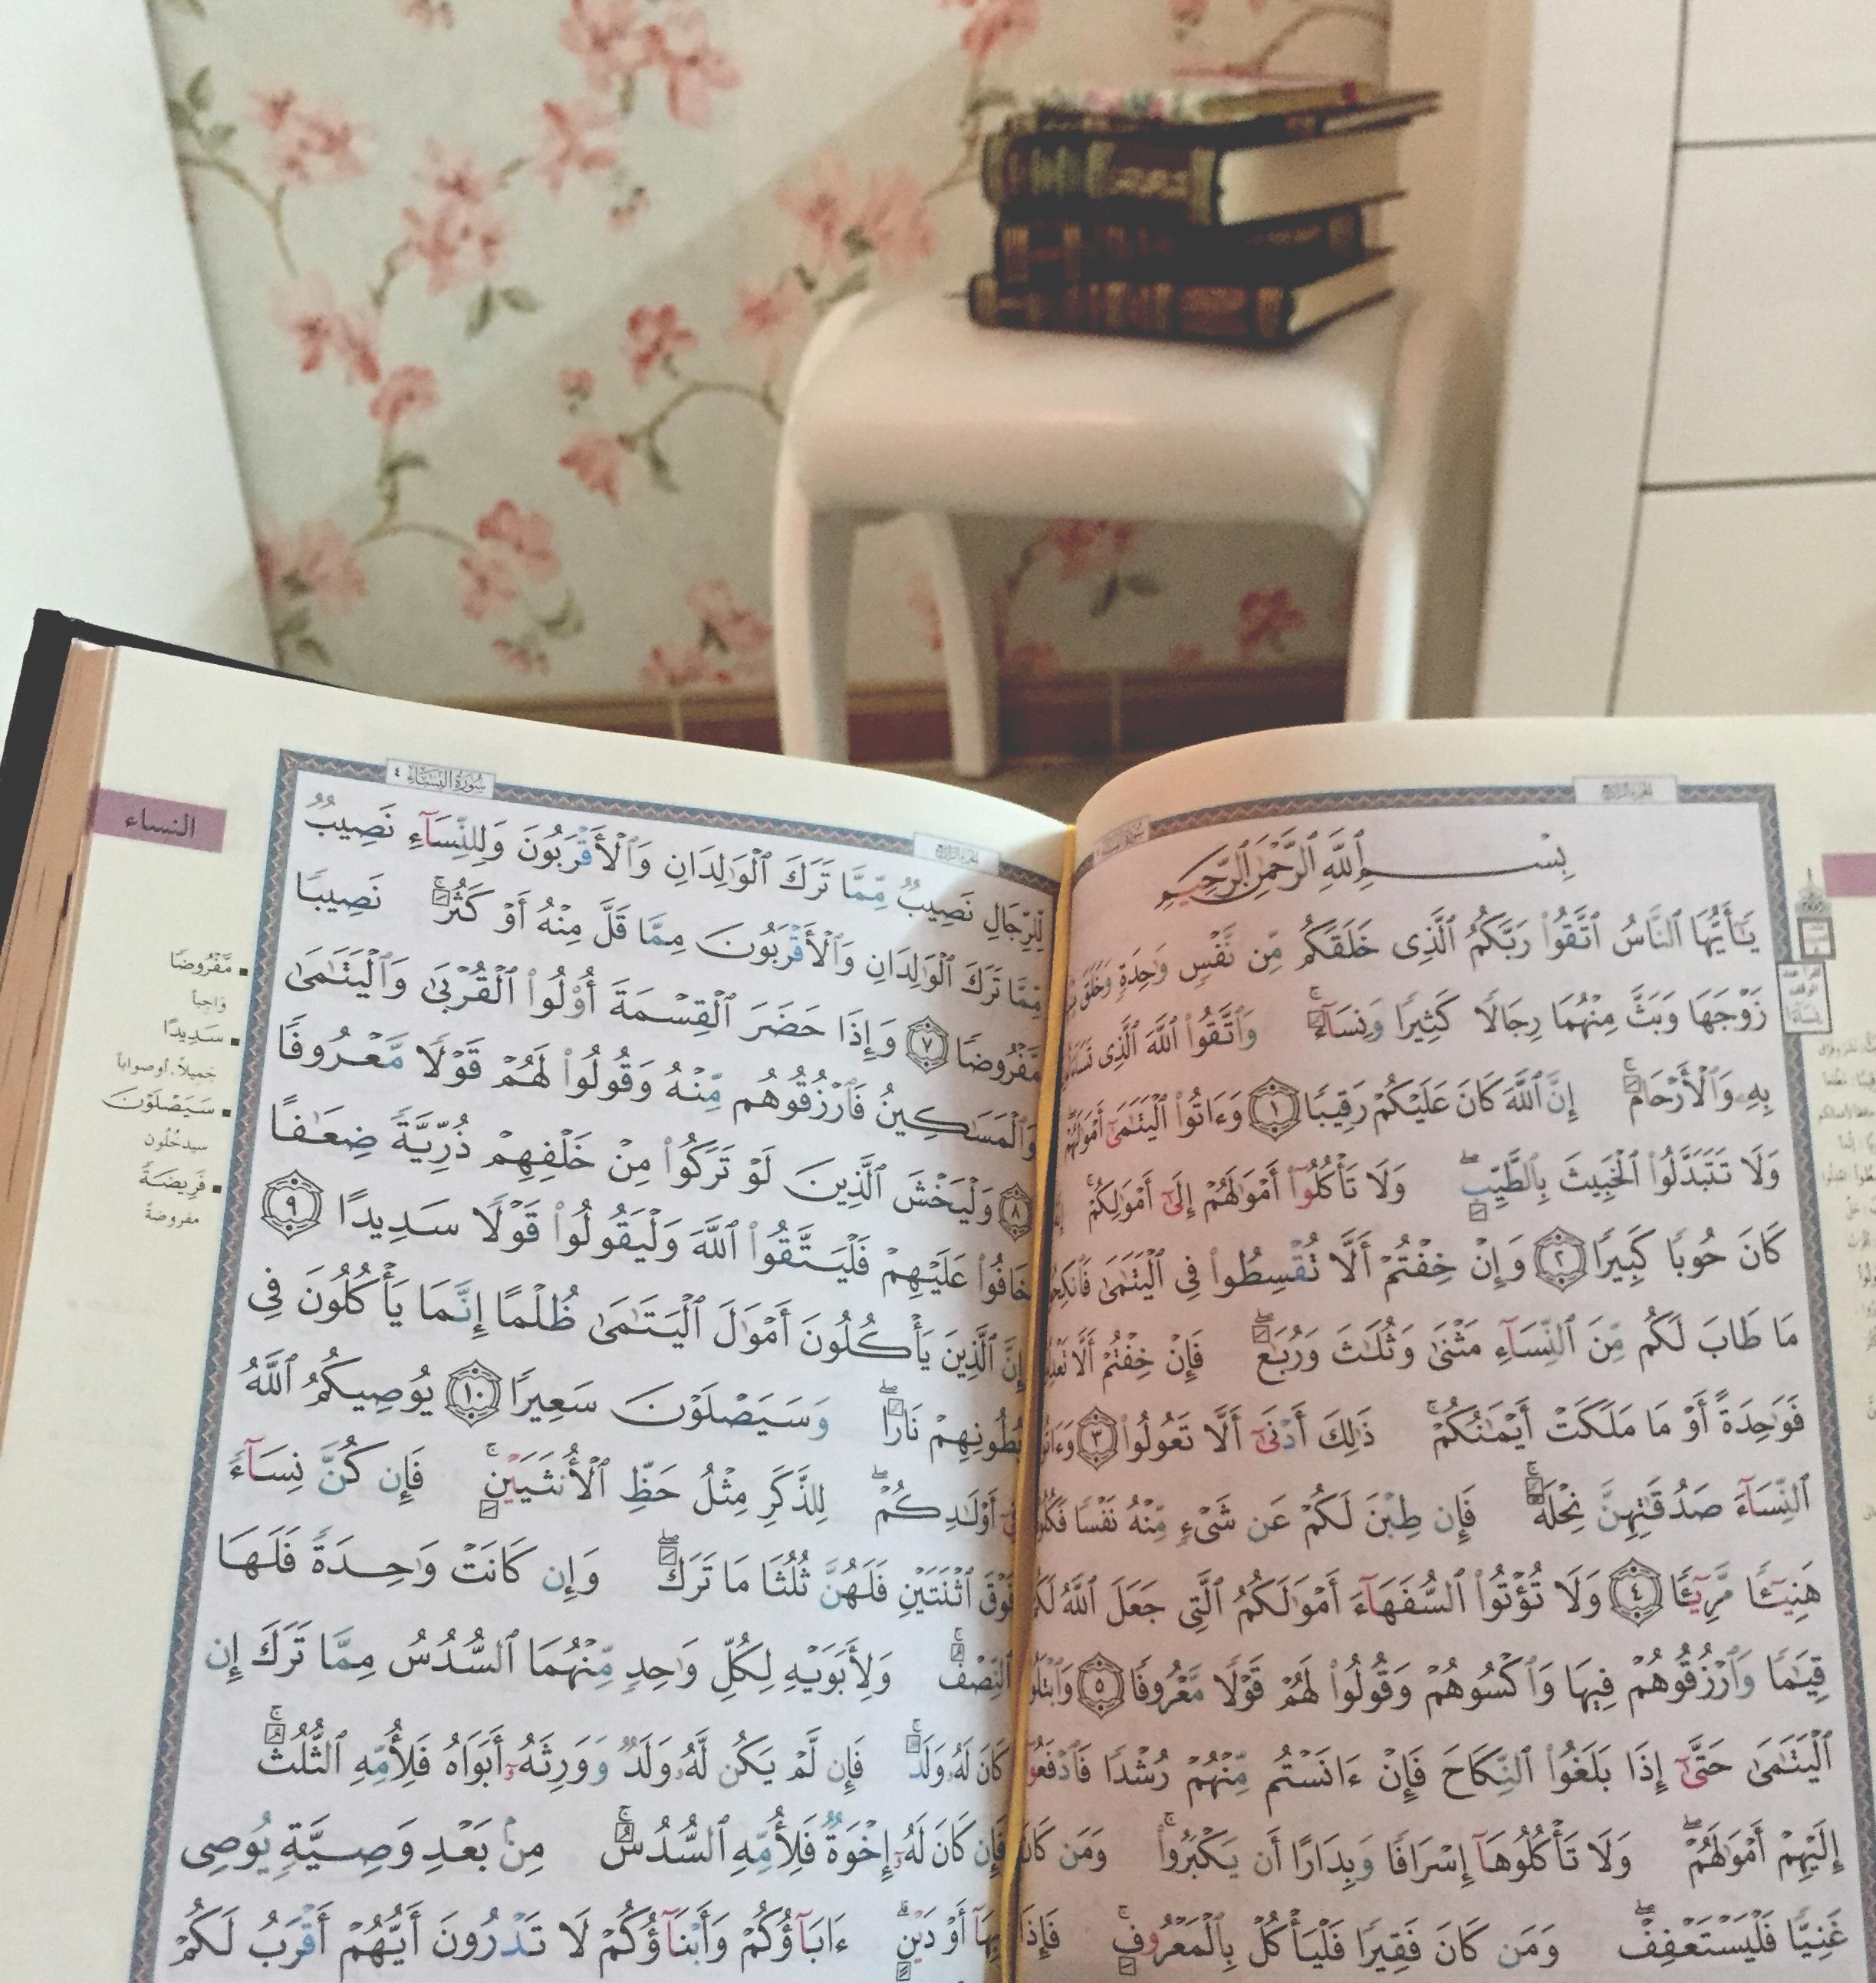 Quran Ramadan Islam Muslimah قران القرآن رمضان دين رمزيات تصميم خطوط Niqab Bullet Journal Supplies Journal